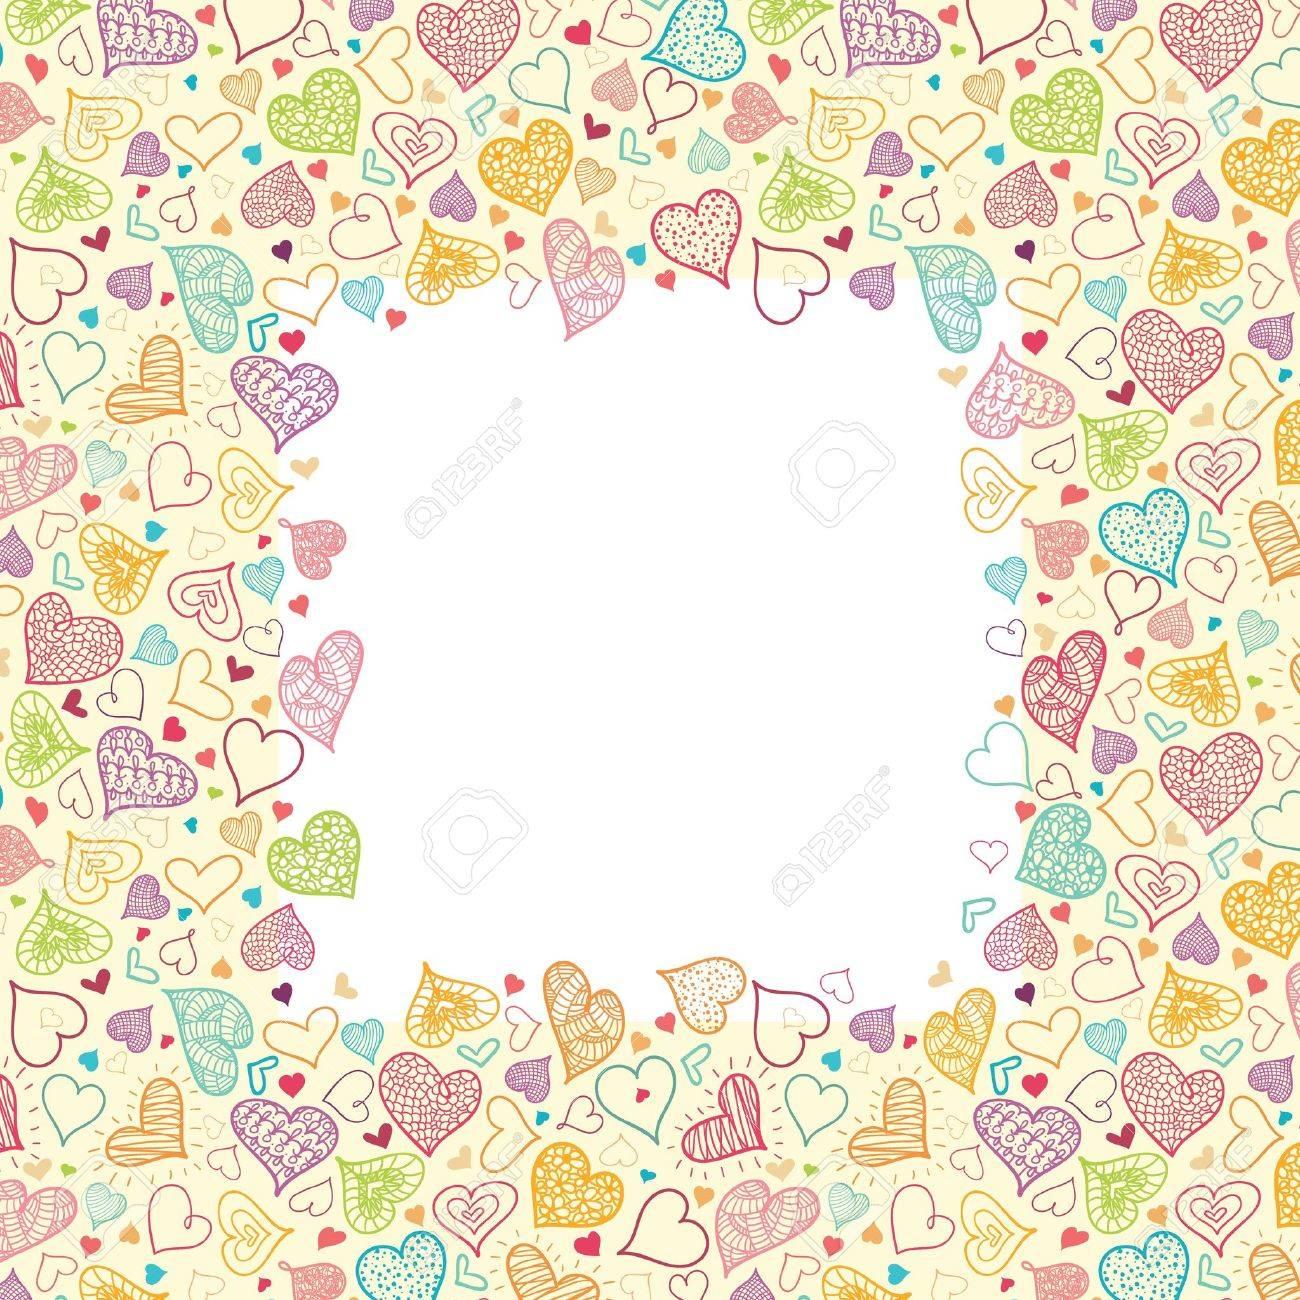 Doodle Hearts Vertical Frame Background Border Stock Vector - 16446304